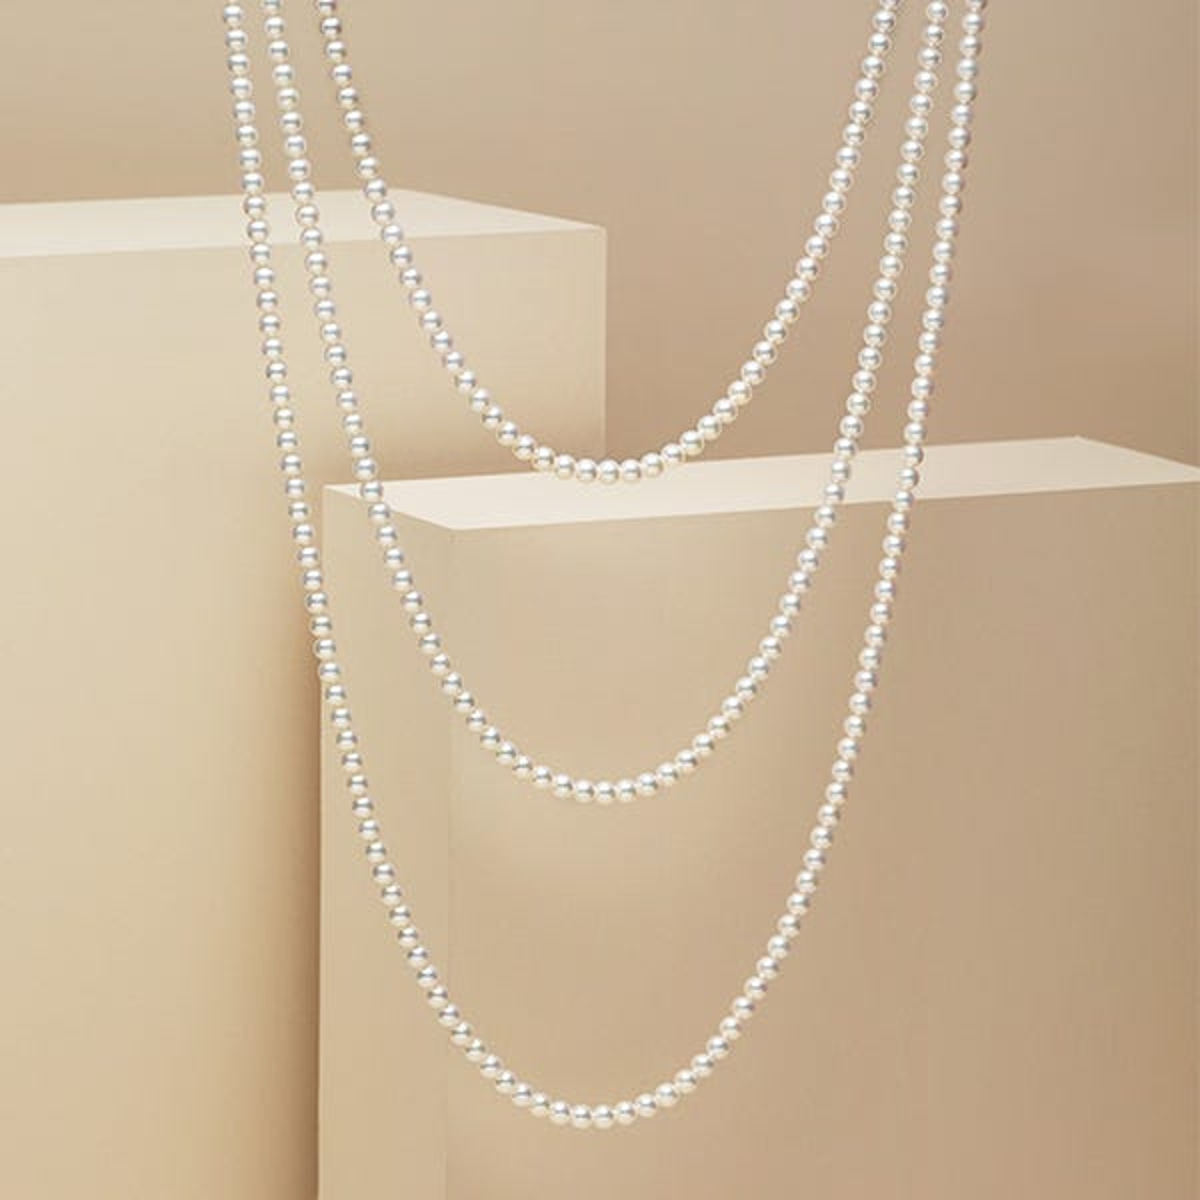 La plus lumineuse de toutes : la perle MIKIMOTO